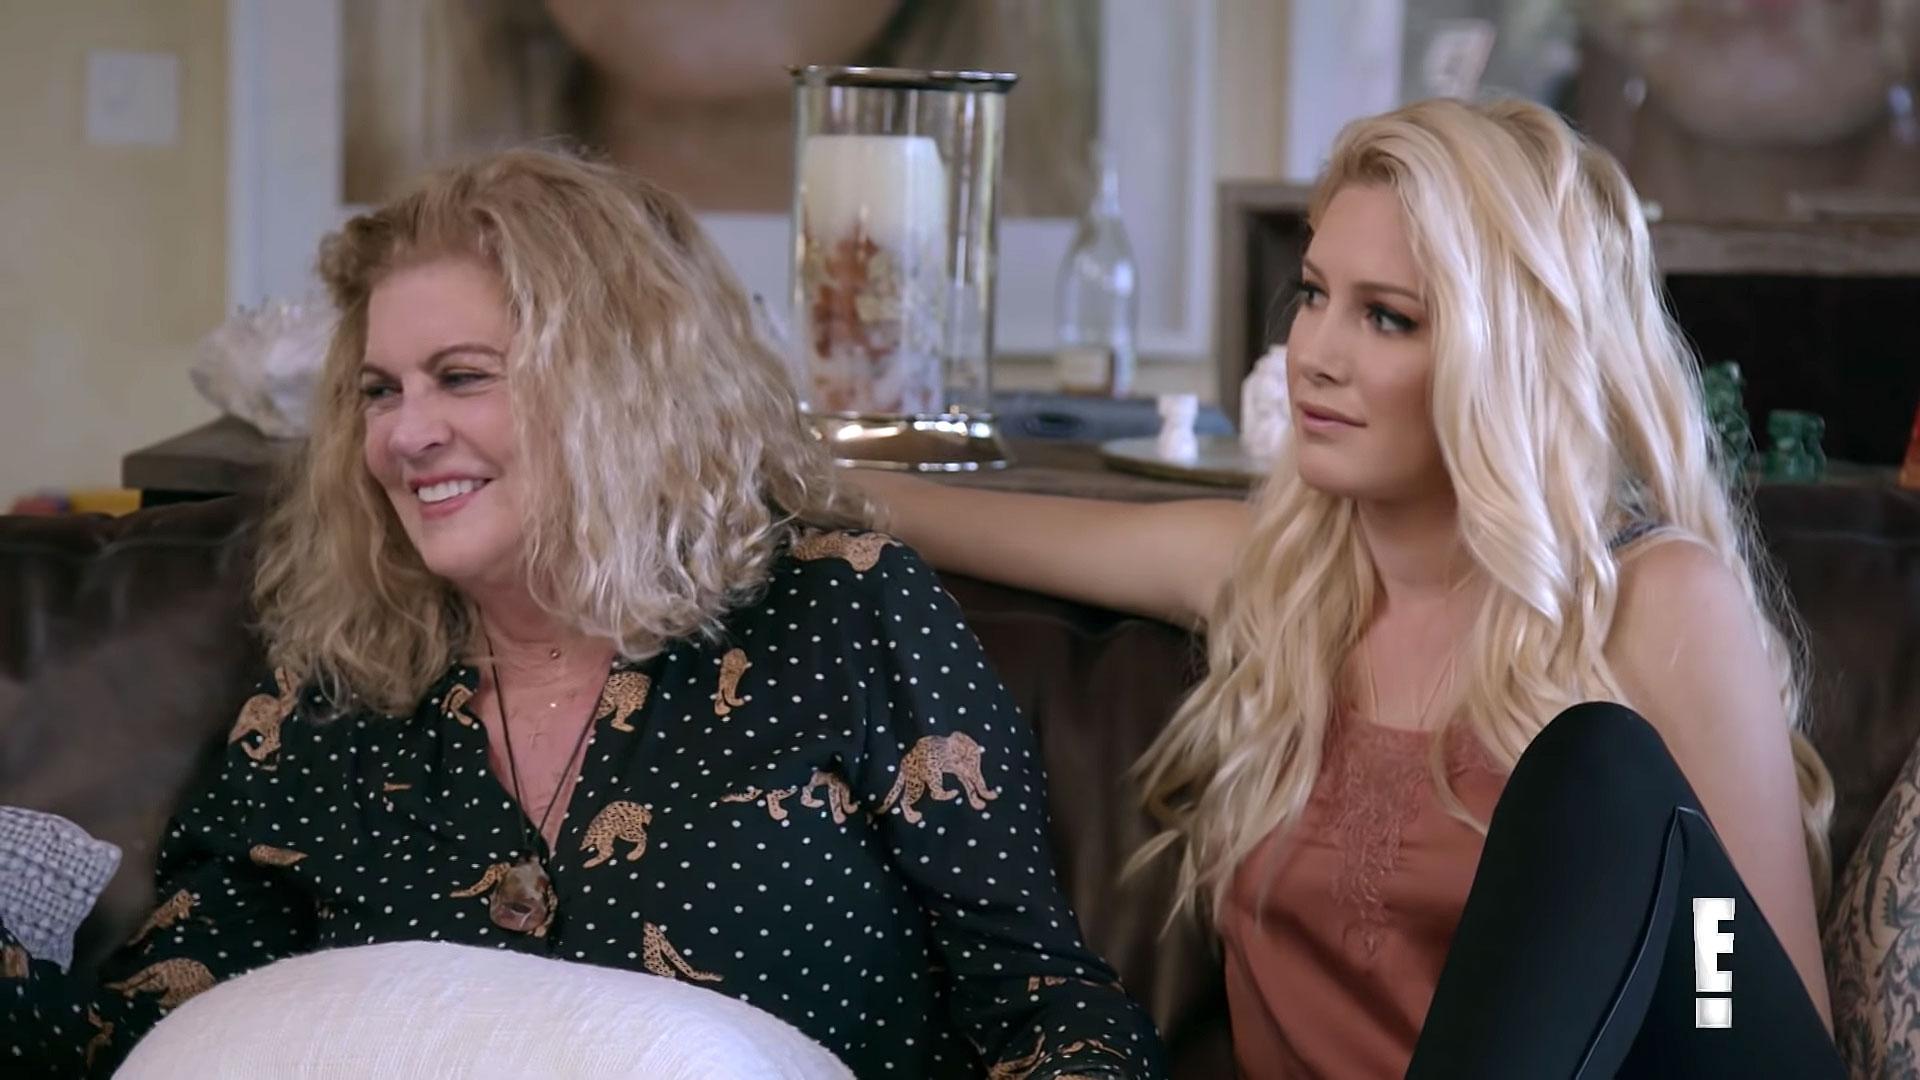 Heidi Montag Comforts Spencer Pratts Mom Youtube - Janet Pratt and Heidi Montag